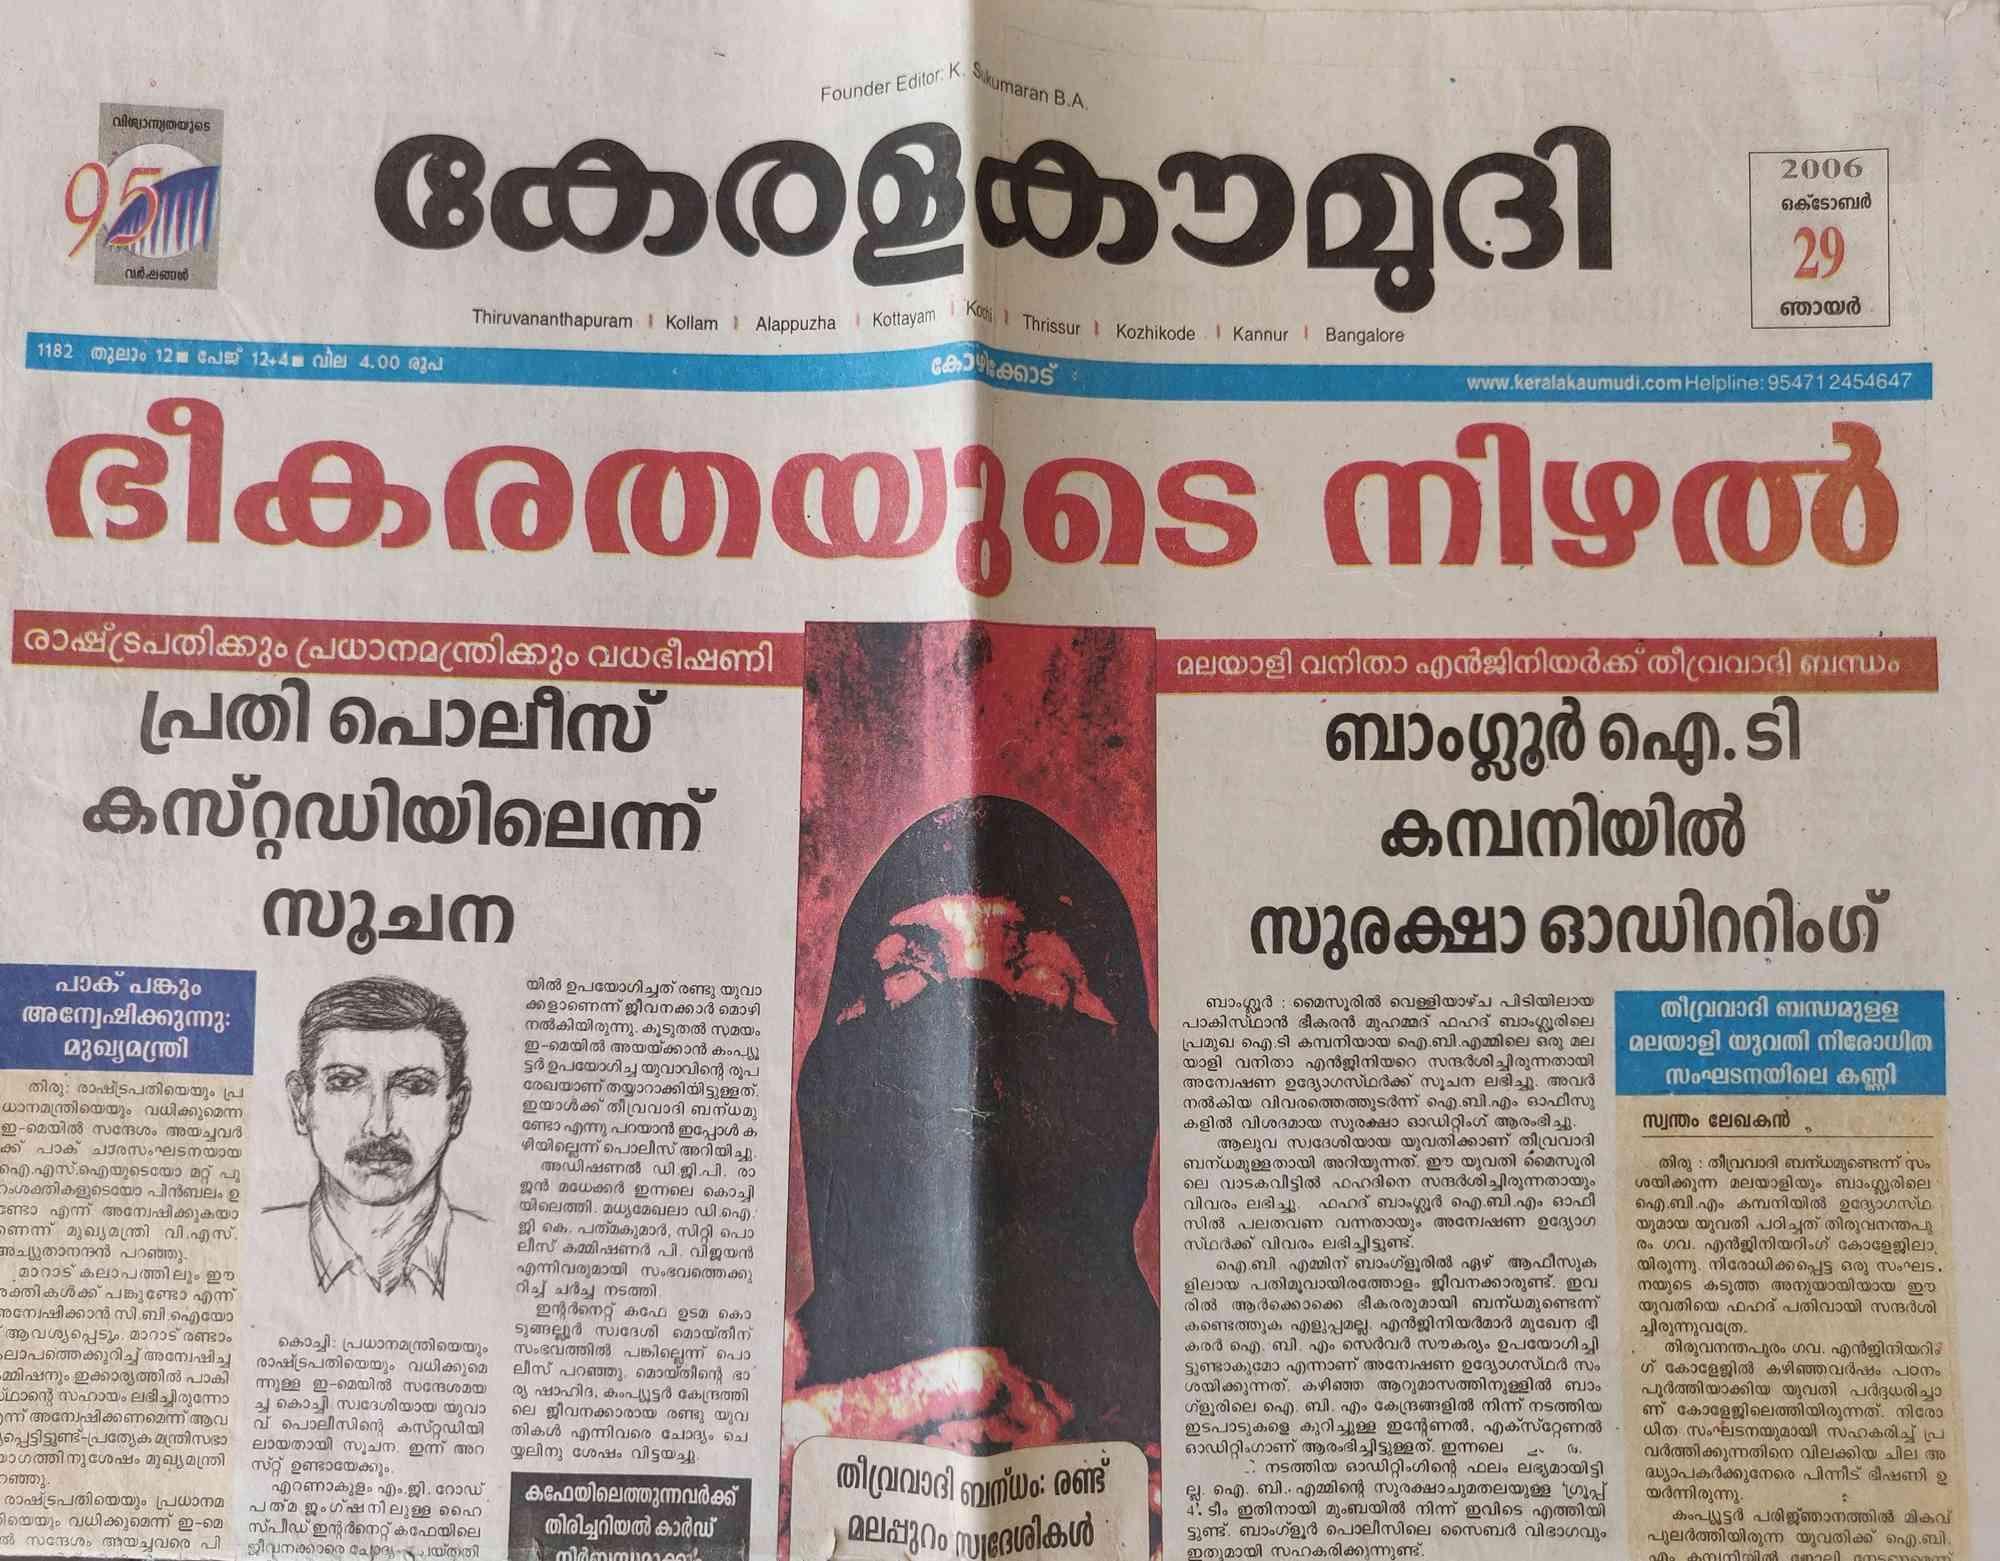 Kerala Kaumudi reported in 2006 that Razik Raheem's wife, who was working with IBM, had international terror links.